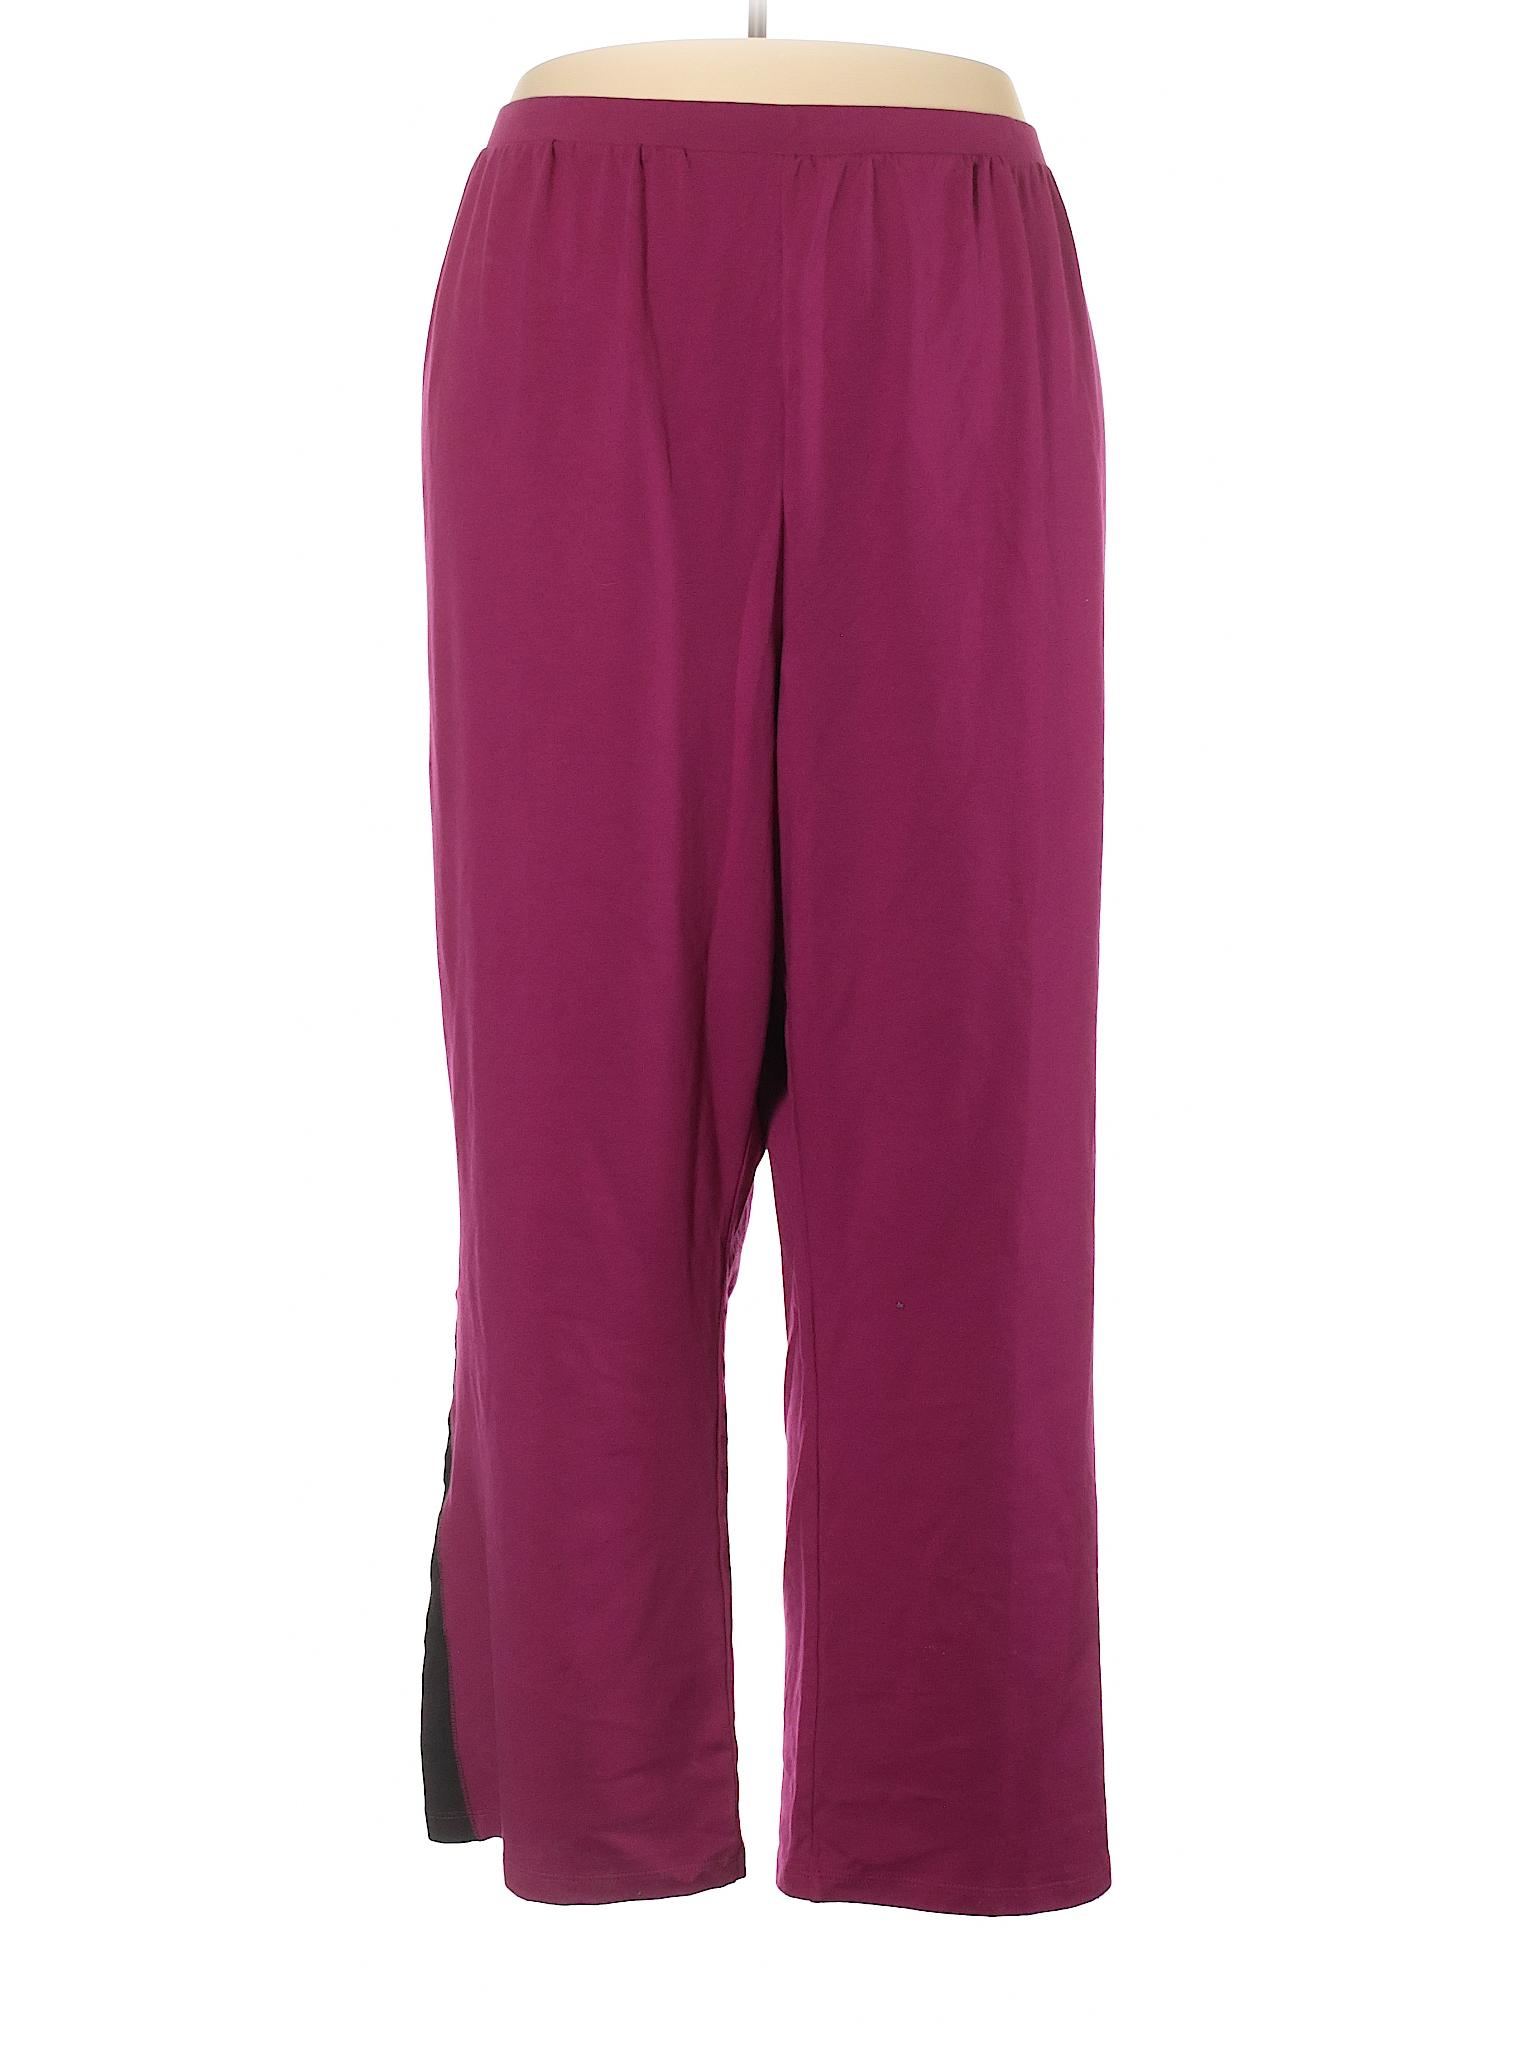 Catherines for Me Pants Casual Leisure Liz winter amp; xzqw8IXC6